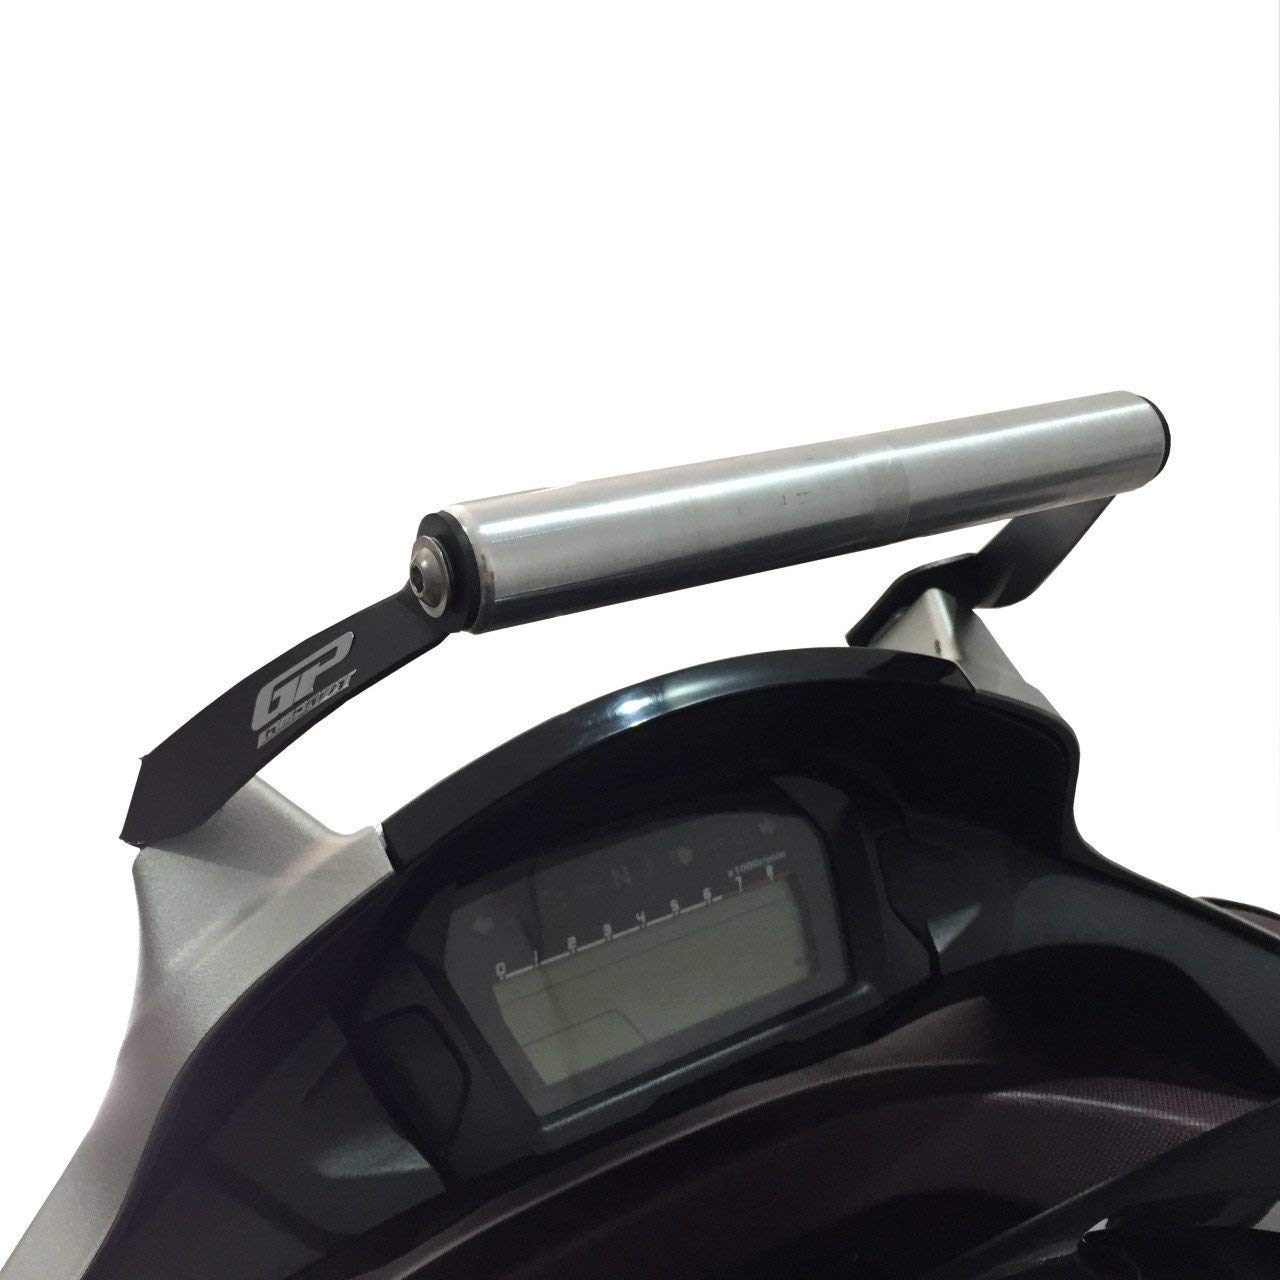 Navigation Mounting GPS Rack Mount Compatible with Honda NC750D Integra (2014-2018) by GpK